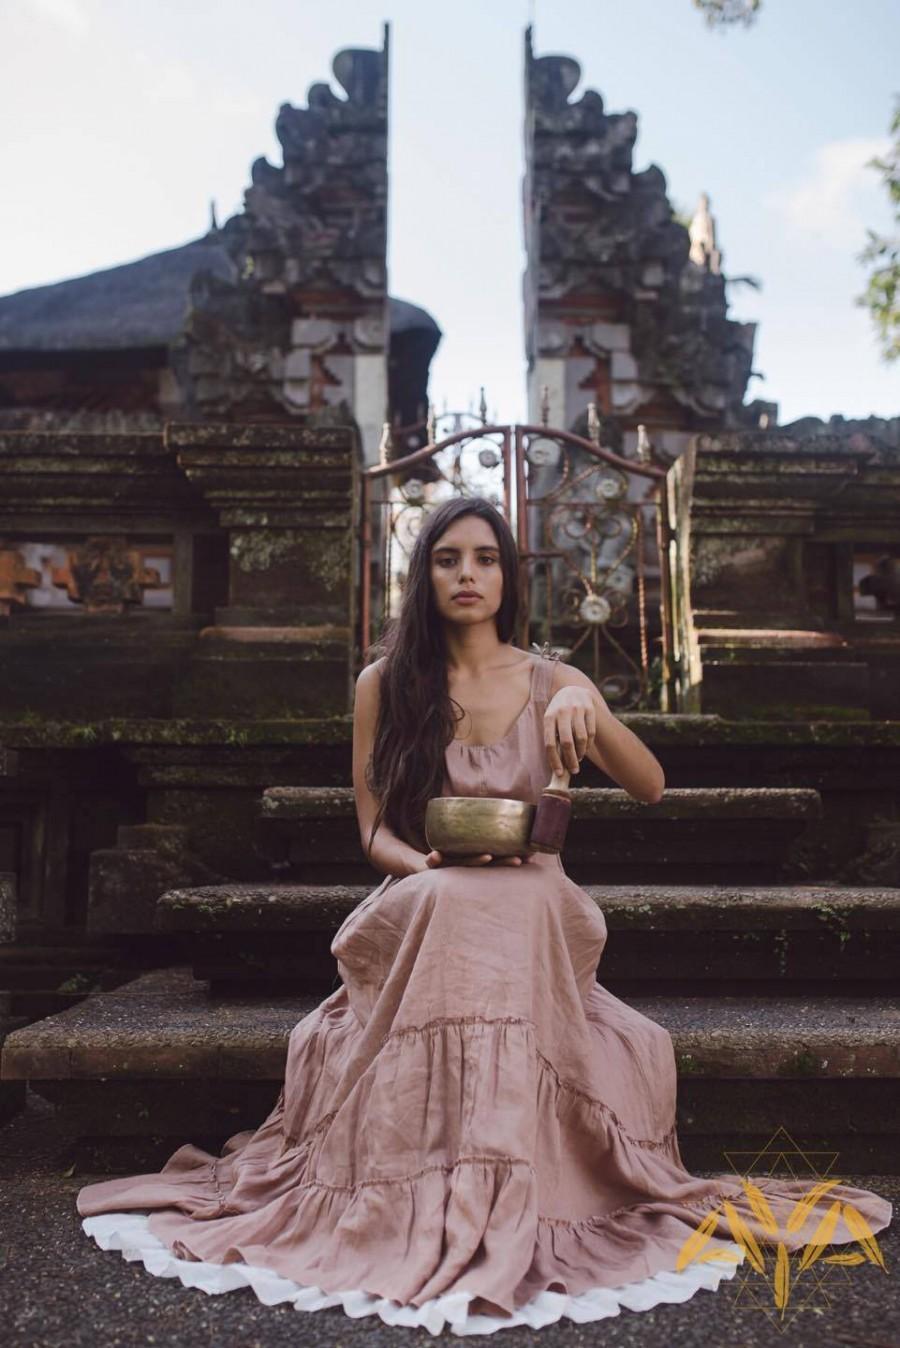 Wedding - Linen Boho Dresses for Women • Bohemian Dress Pink • Sustainable Linen Clothing • Pink Sleeveless Maxi Dress • Pure Organic Linen Dress